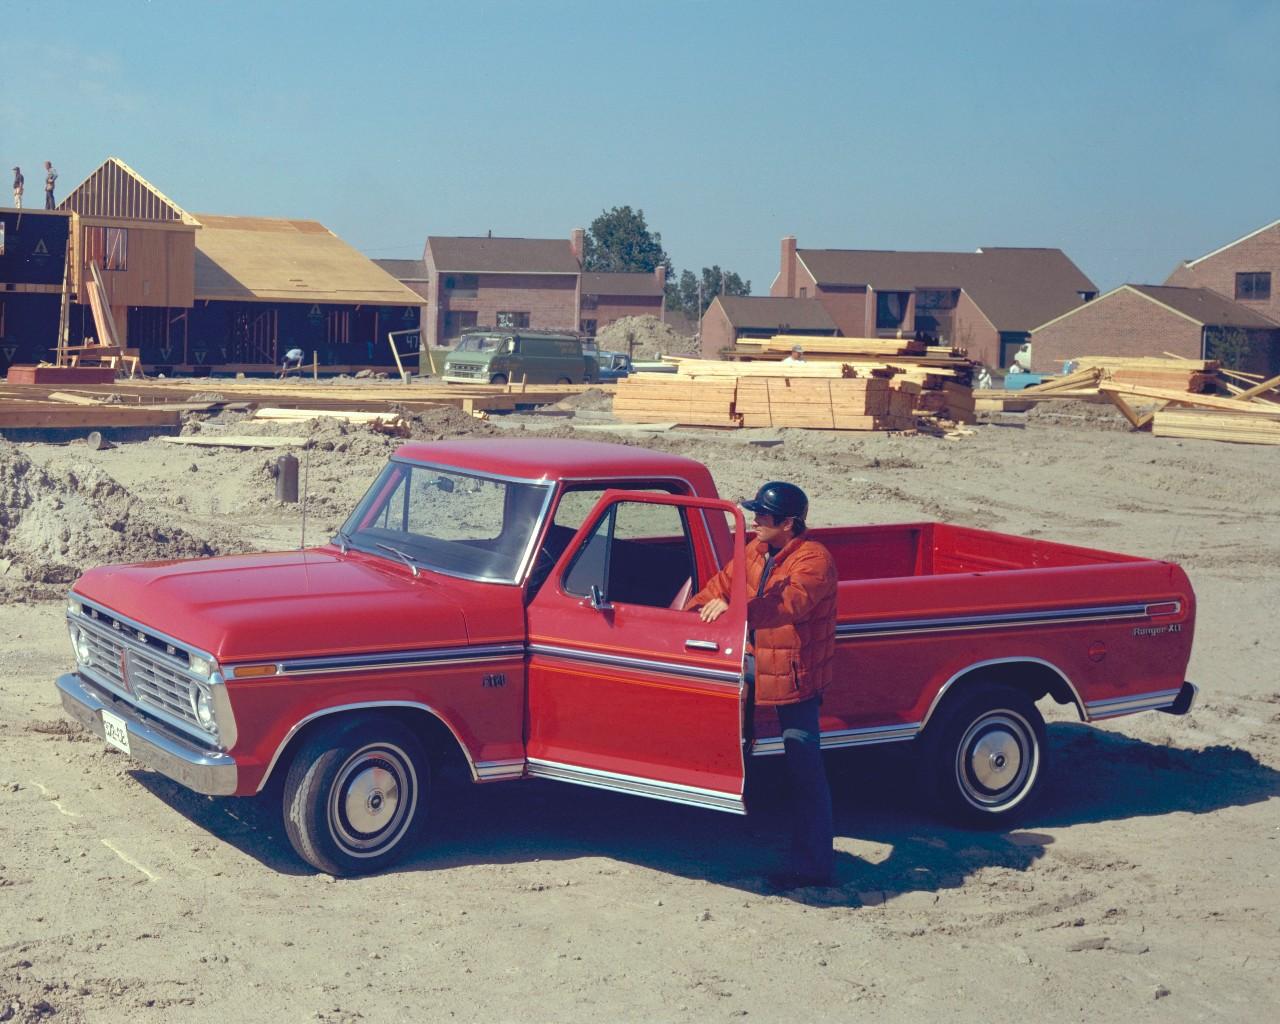 1975 Ford F-150 pickup truck